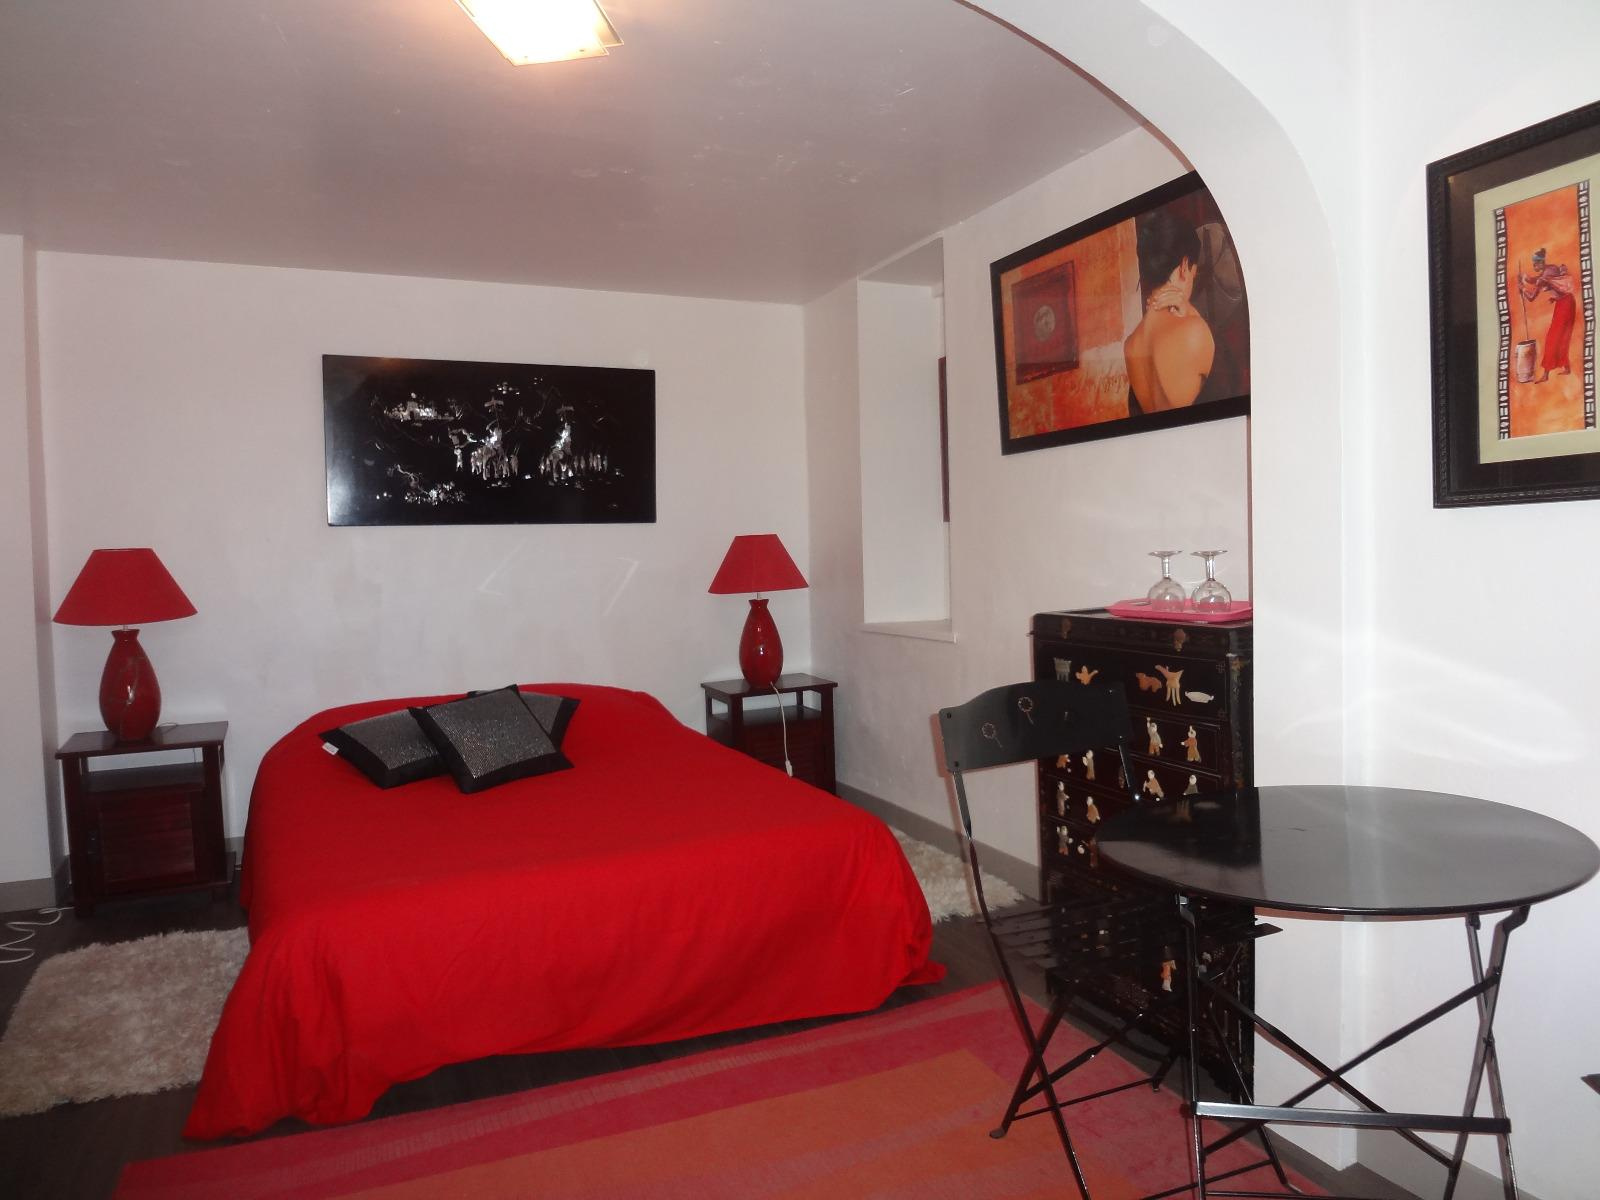 Vente chambres d 39 h tes maison a vendre proche de montrichard for Loi chambre hote